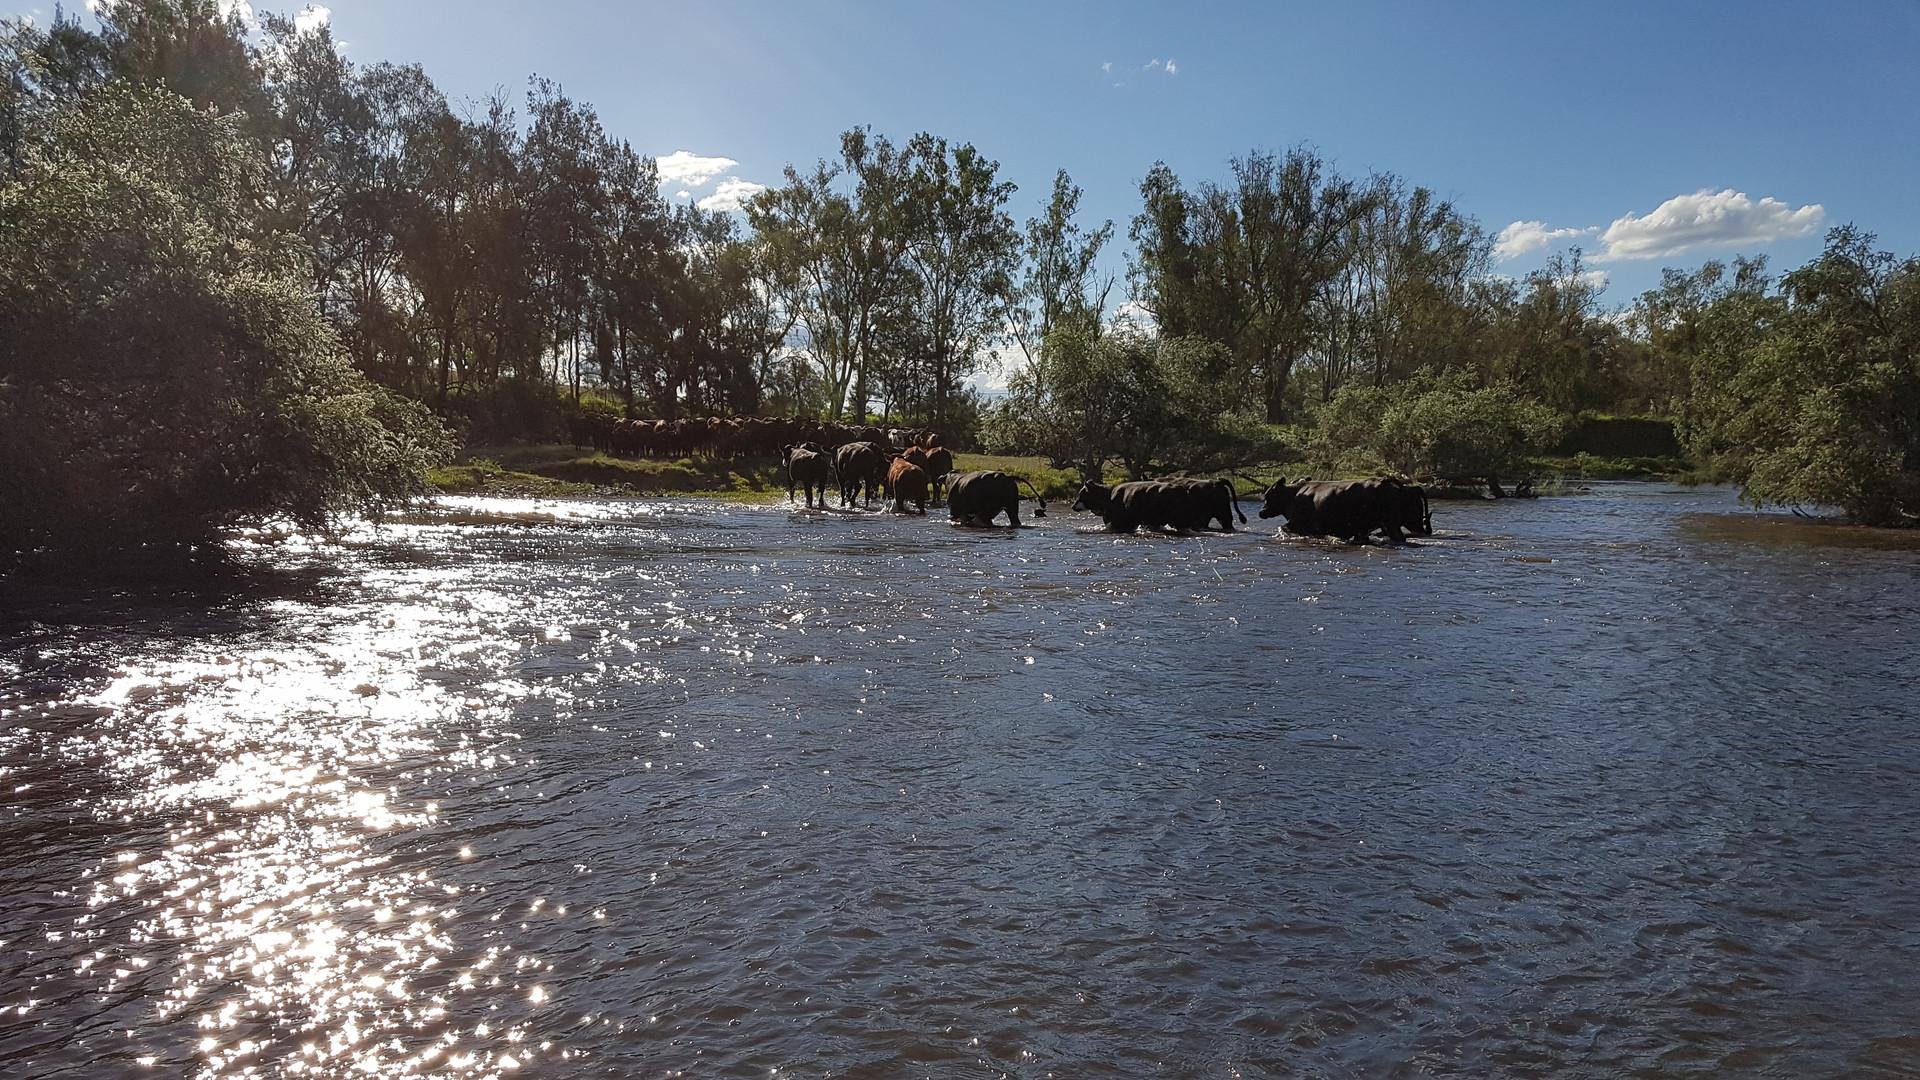 20170107_cattle crossing river.jpg